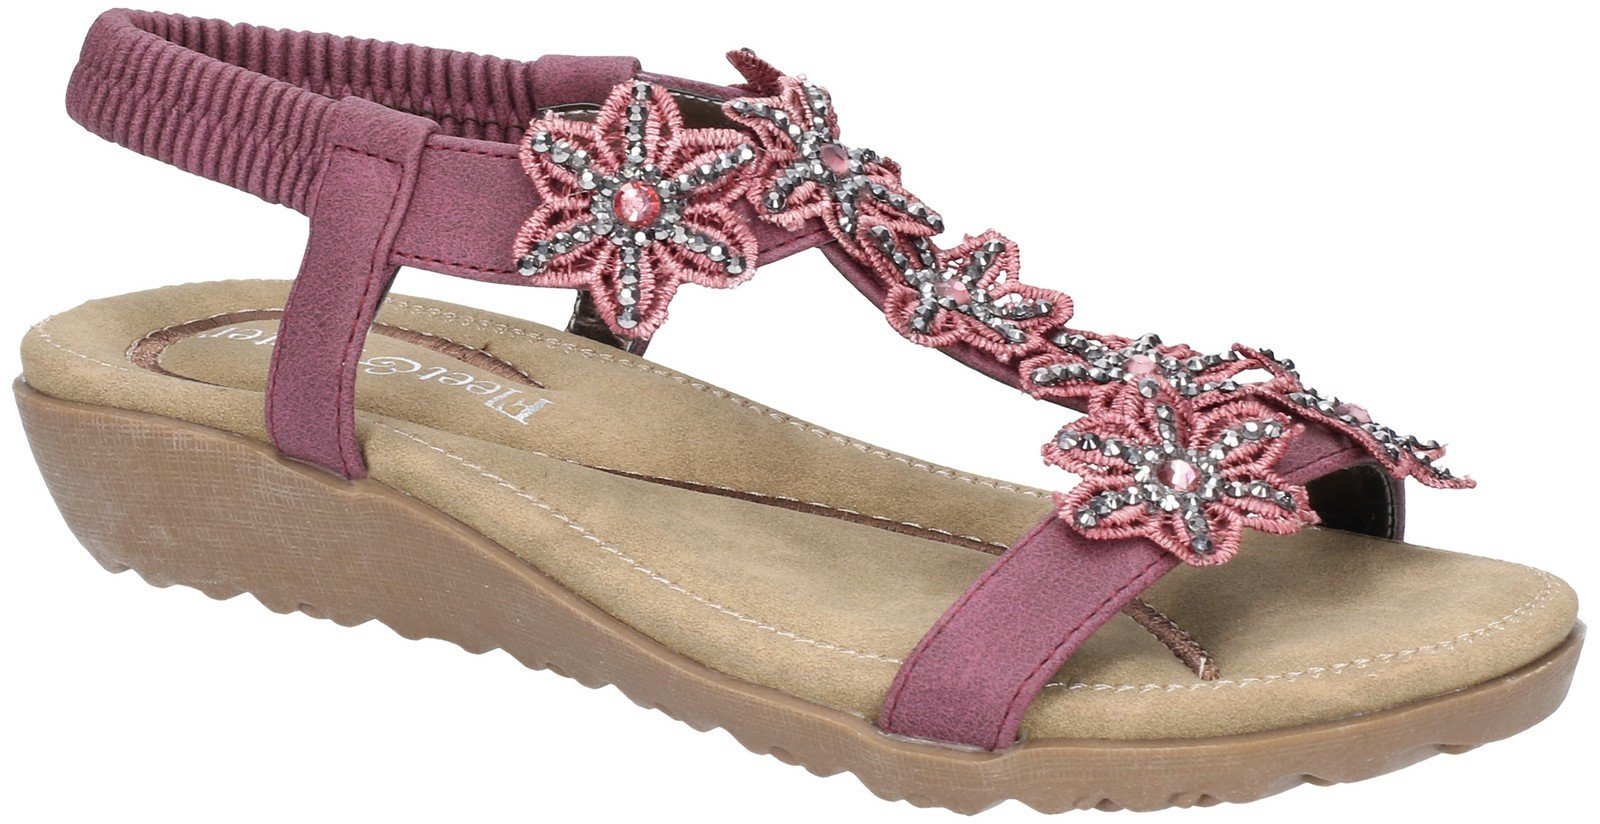 Fleet & Foster Women's Magnolia Elastic Sandal Various Colours 28279 - Plum 3